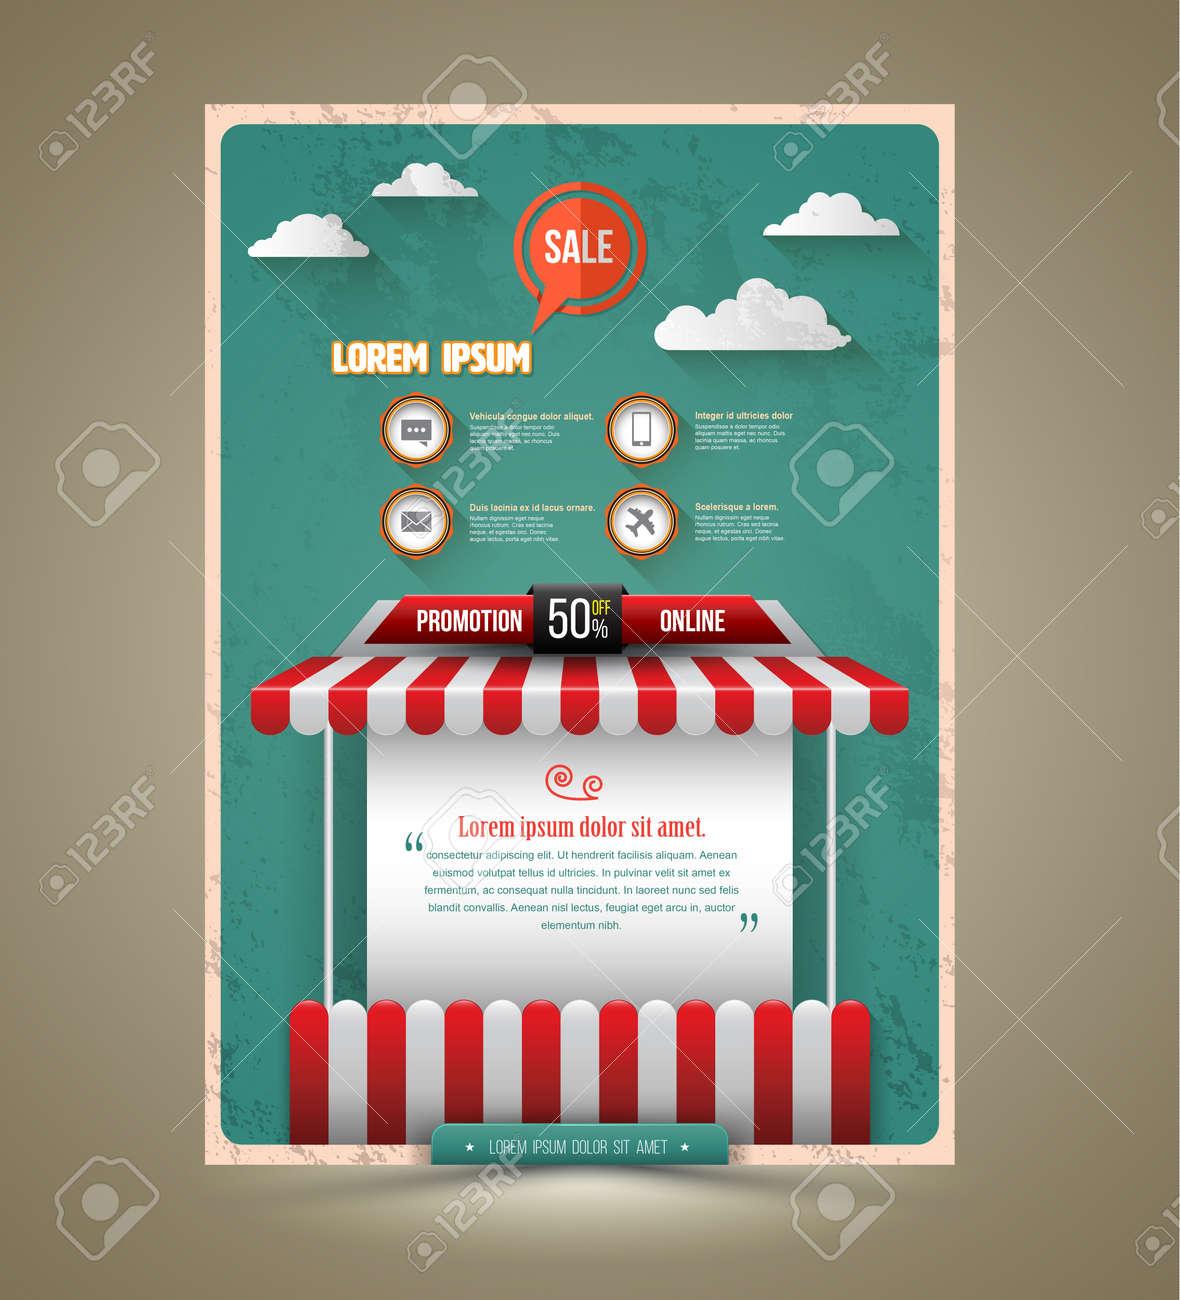 Hot promotion sale poster roof shop vintage style. Vector illustration. Can use for promotion sale. - 41723519